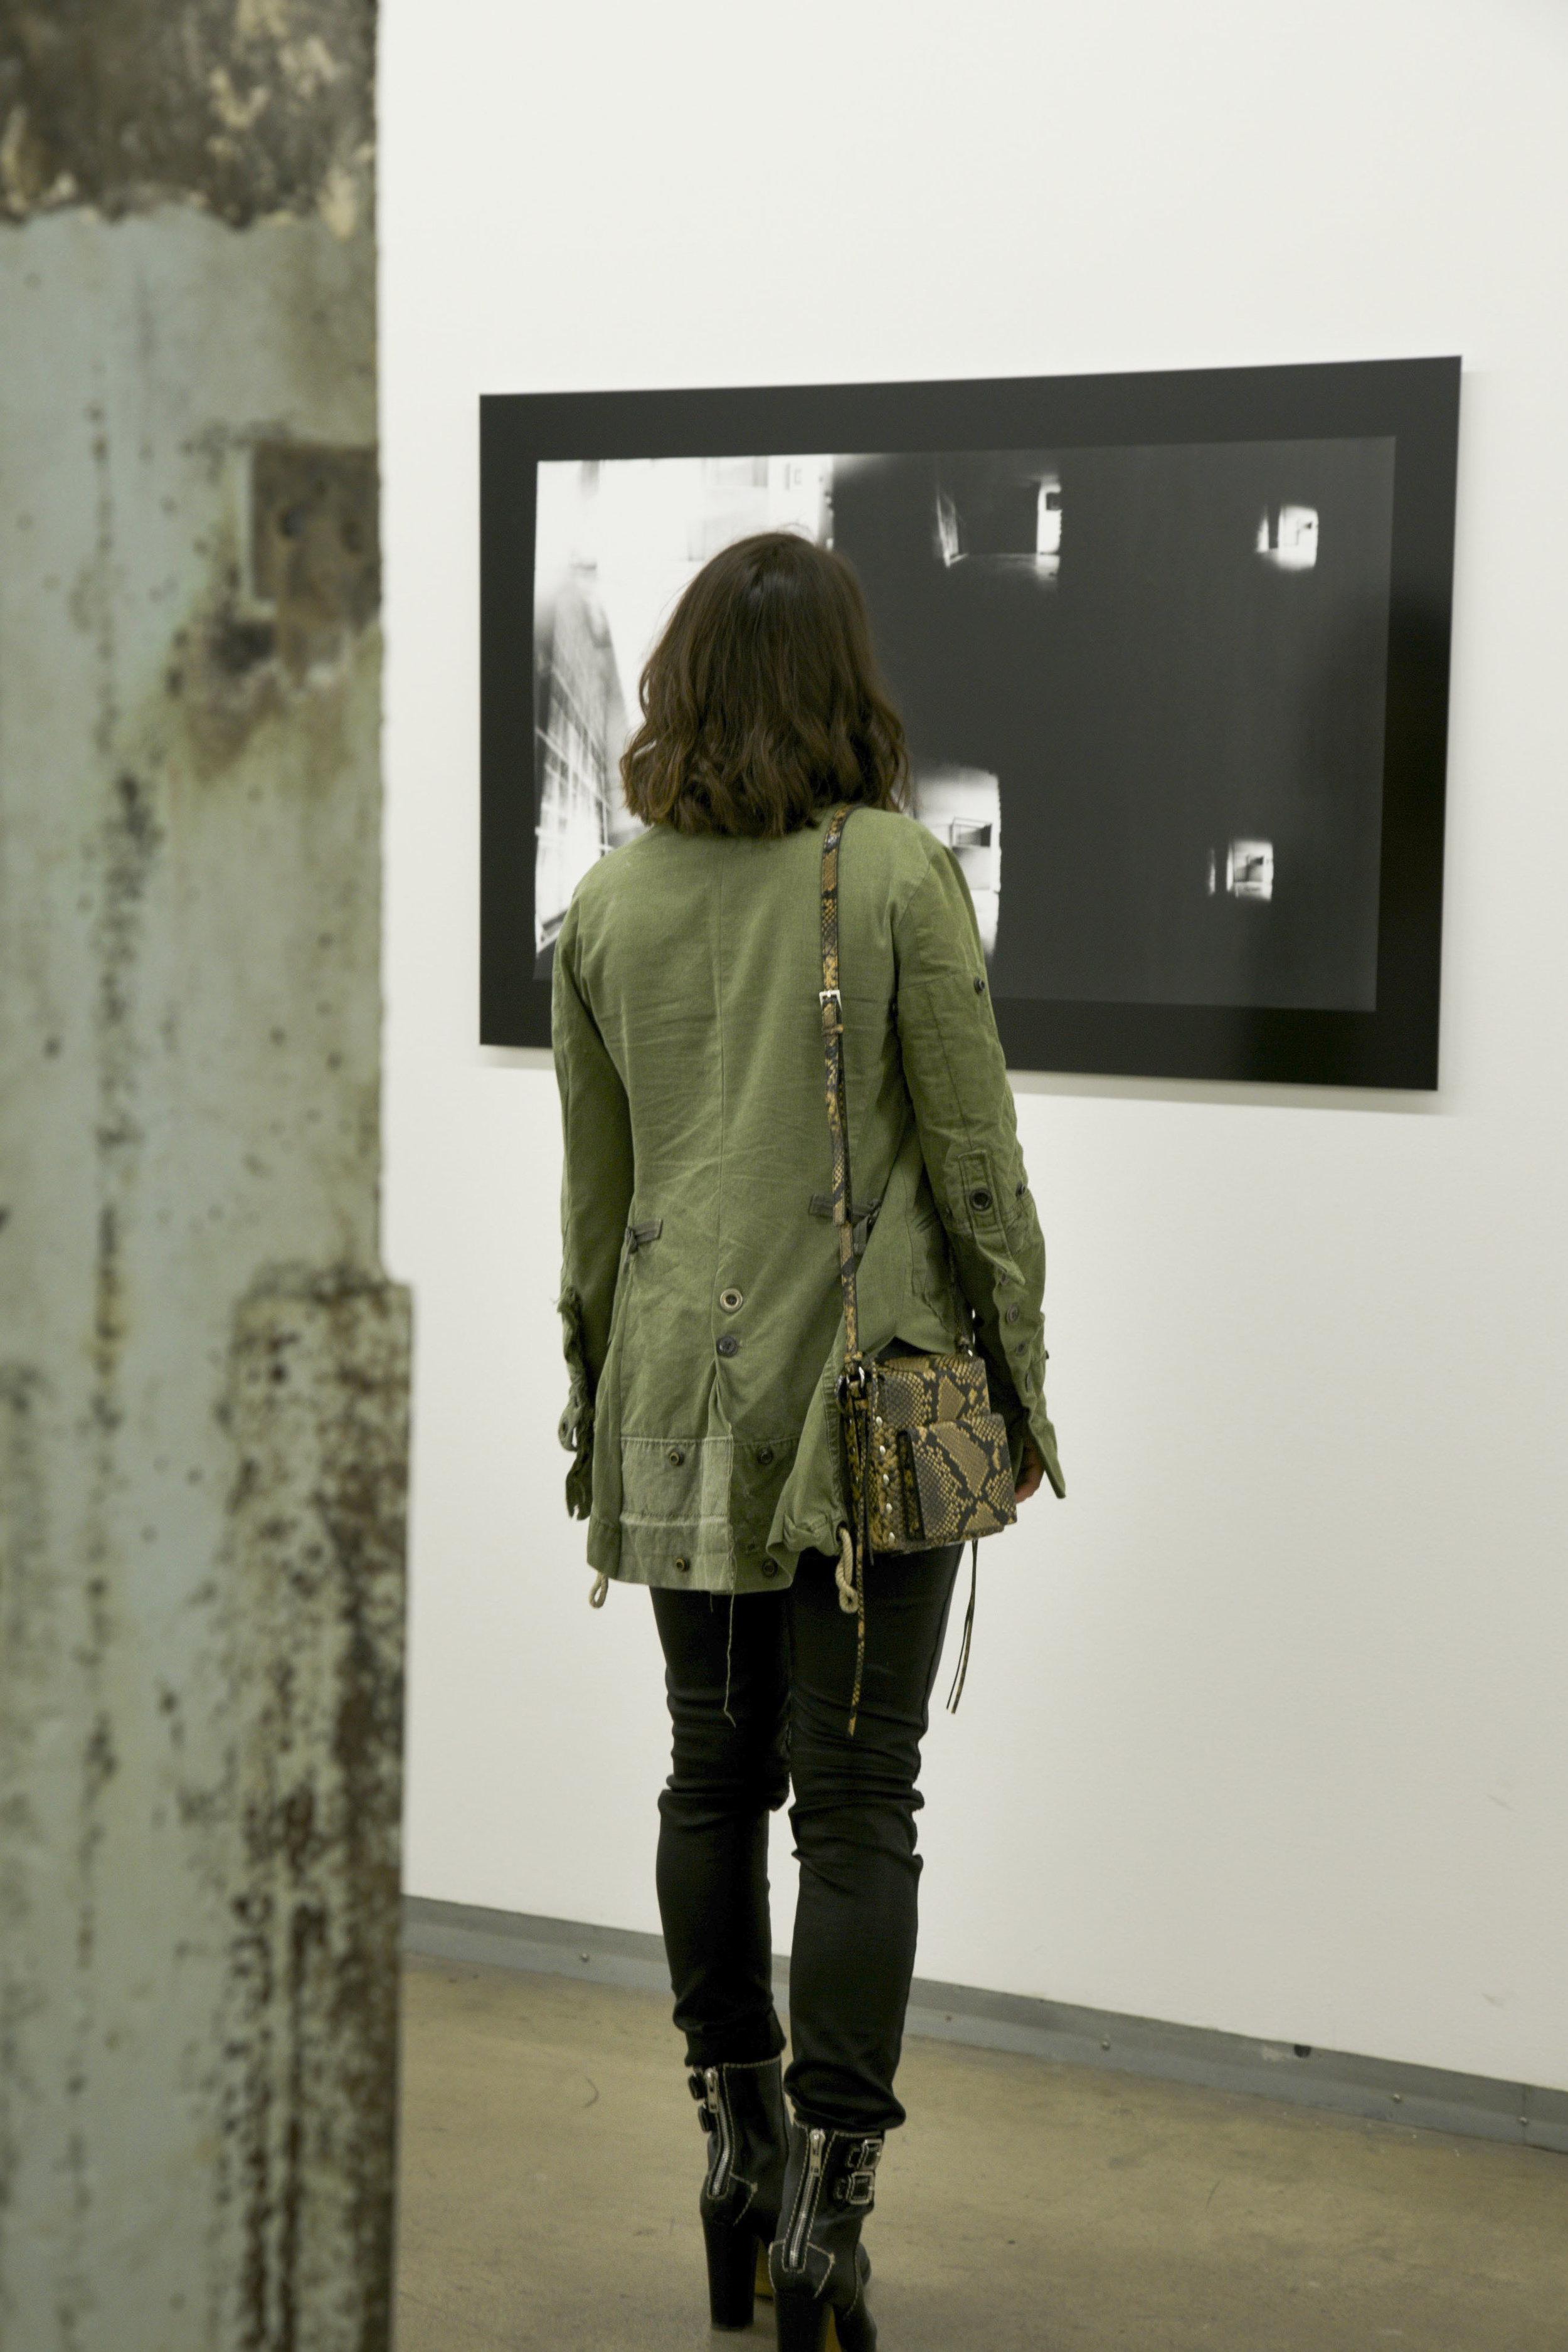 Greg Lauren Jacket, Studio A/W Bag, Club Monaco T-shirt, Robin's Jean Pants, Chloe Boots.